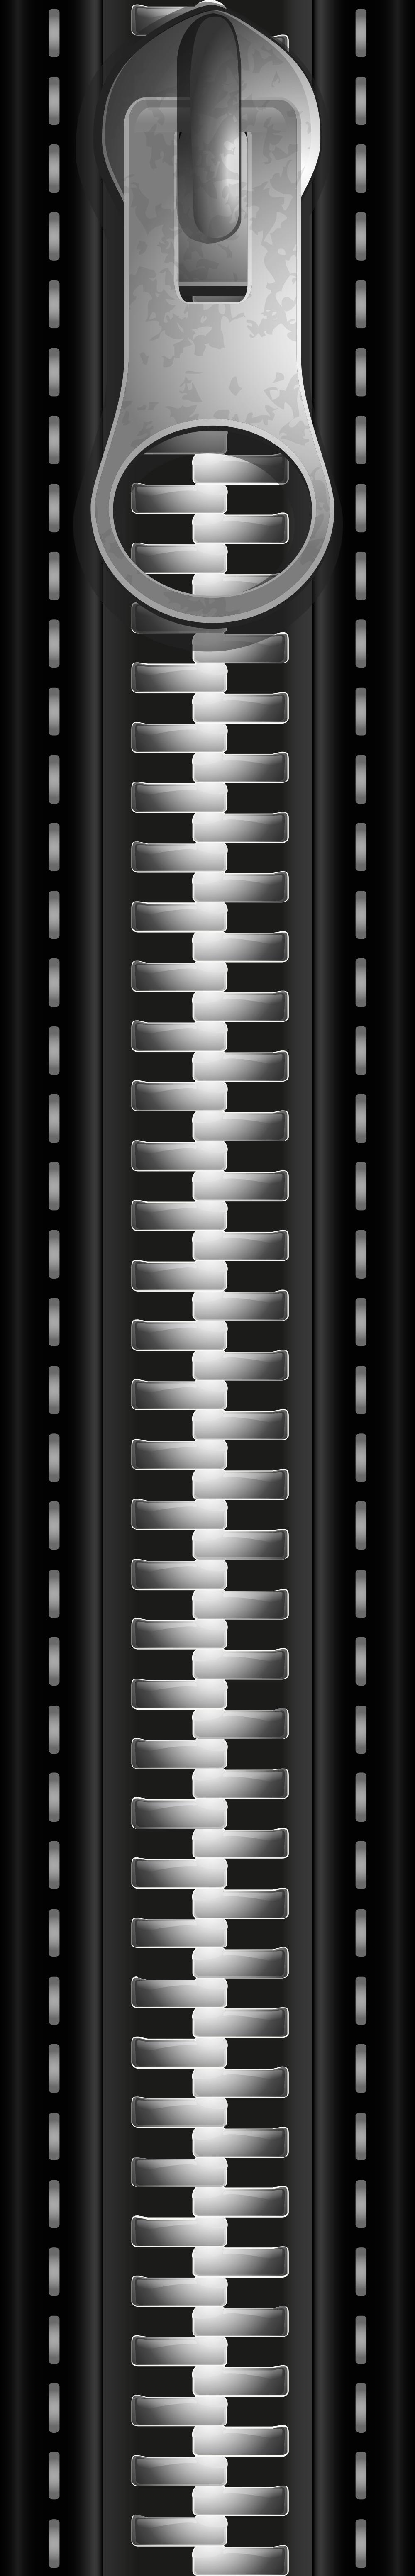 Zipp PNG Clipart Image.